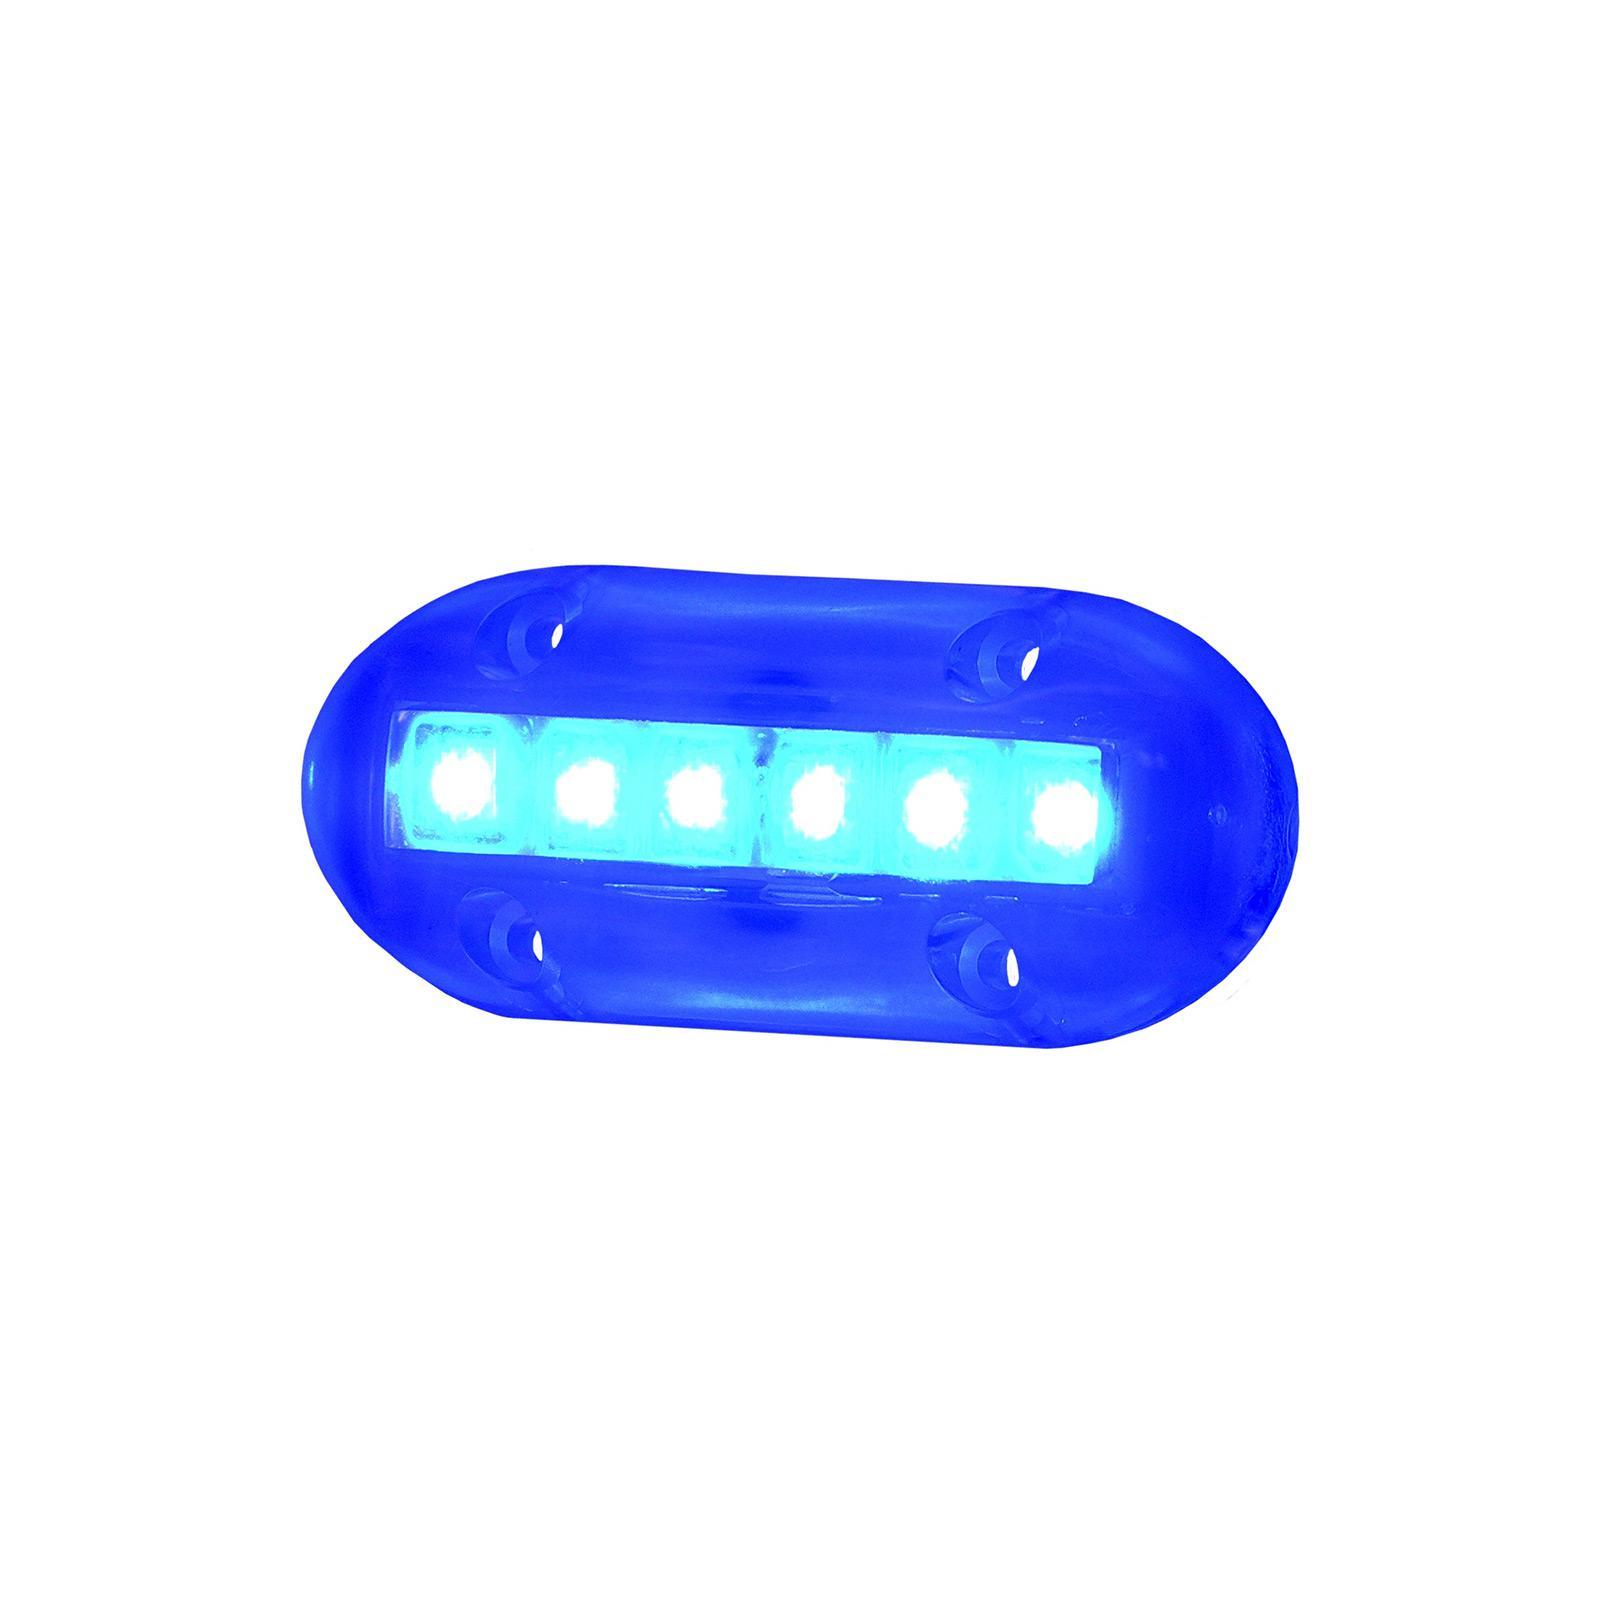 Invincible Aqua Brite LED Underwater Suface Mount 6 Diode, BR51089